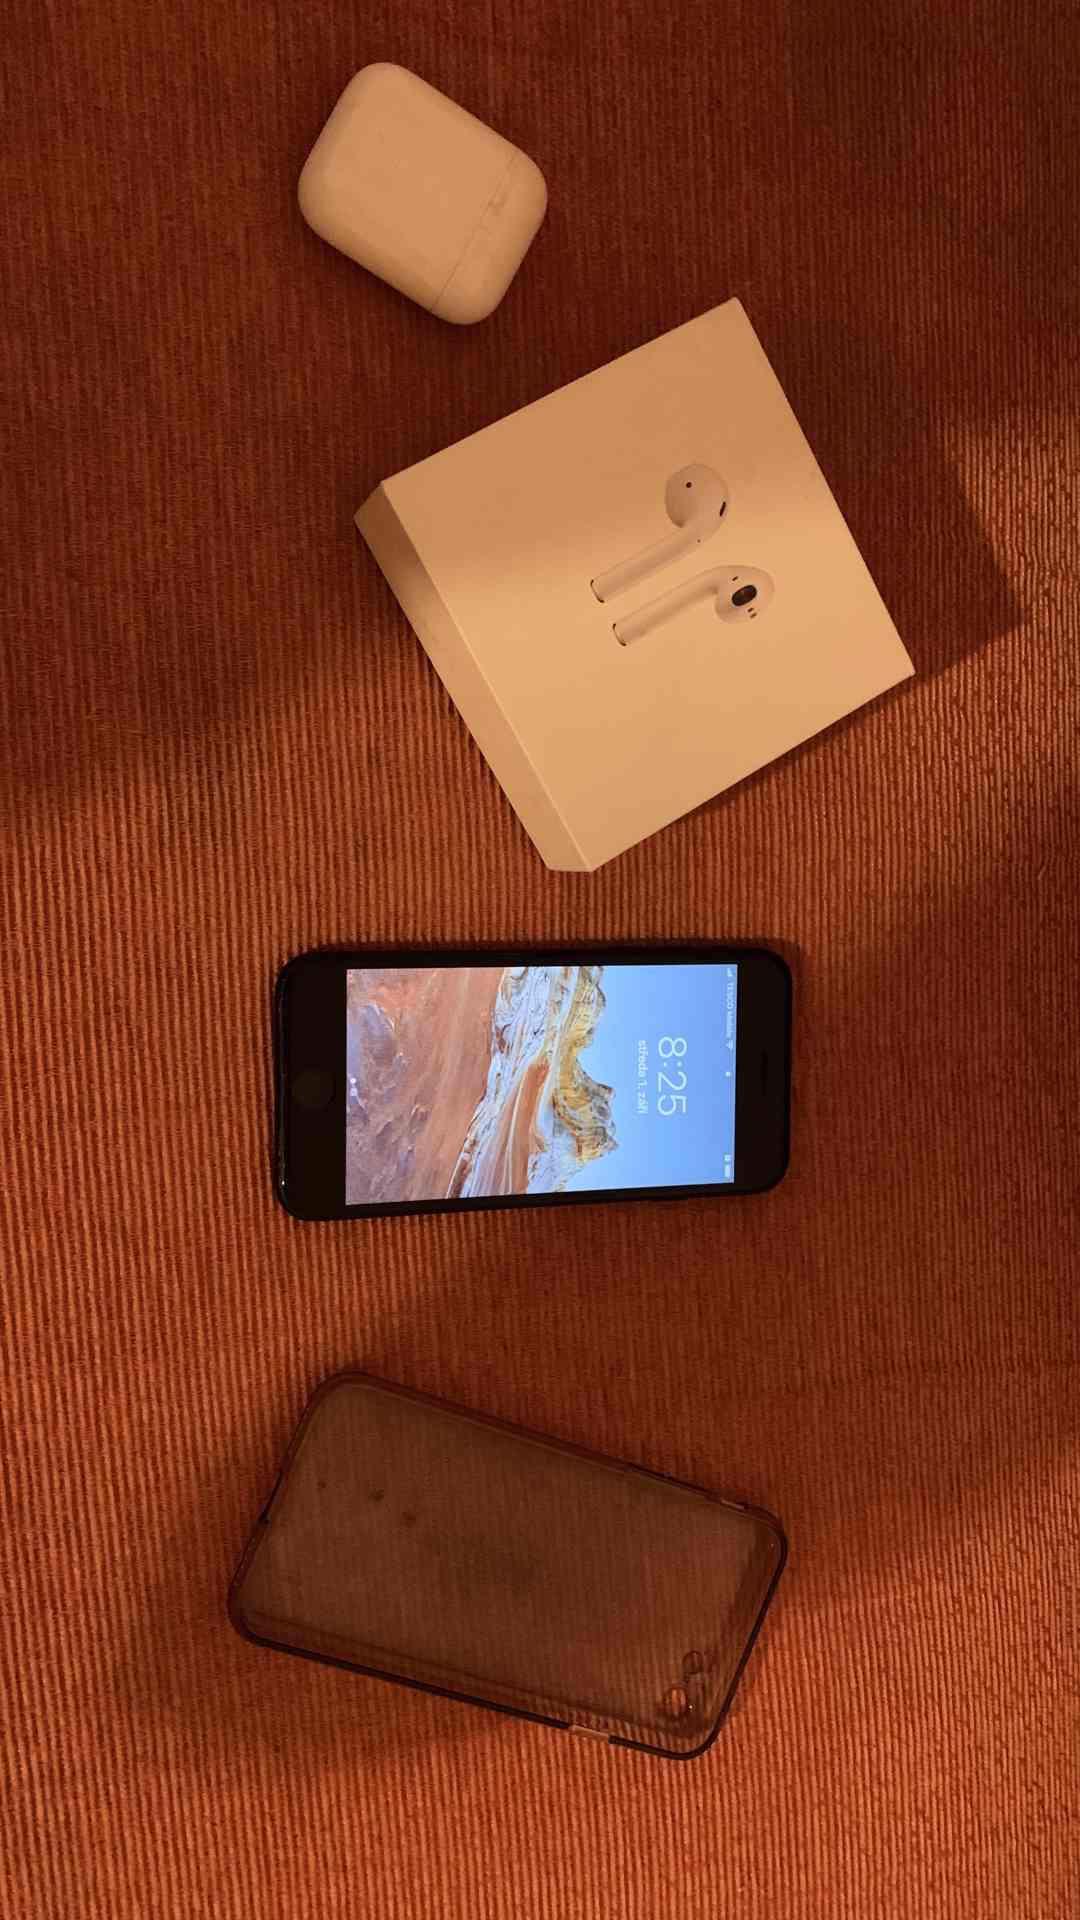 Iphone 7 jet black 32 gb + Airpods, 100 % baterie - foto 1